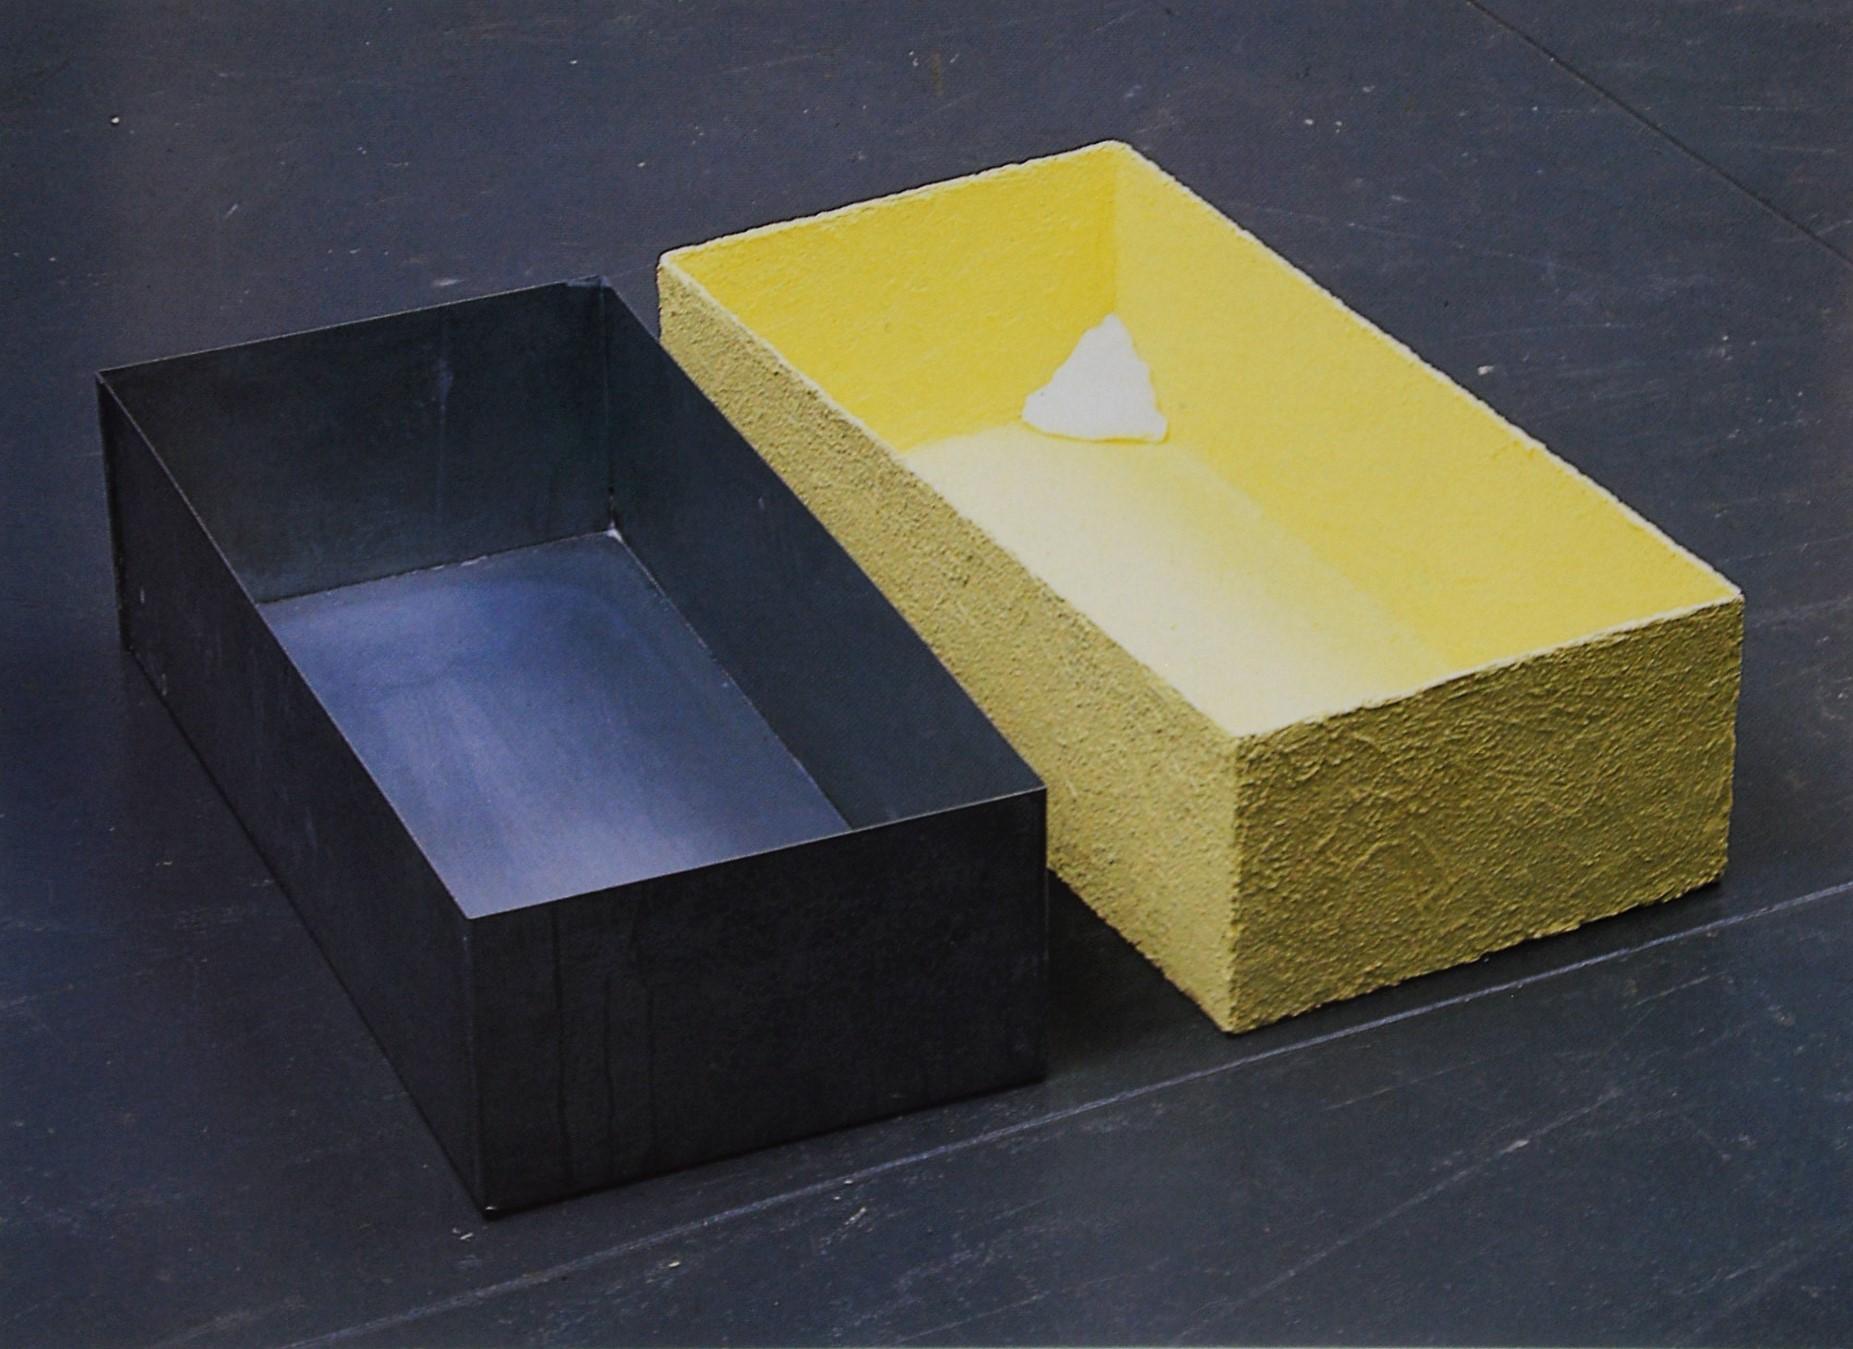 Joseph Beuys. Sulfur covered zinc box plugged corner, 1970. Edición de 200.